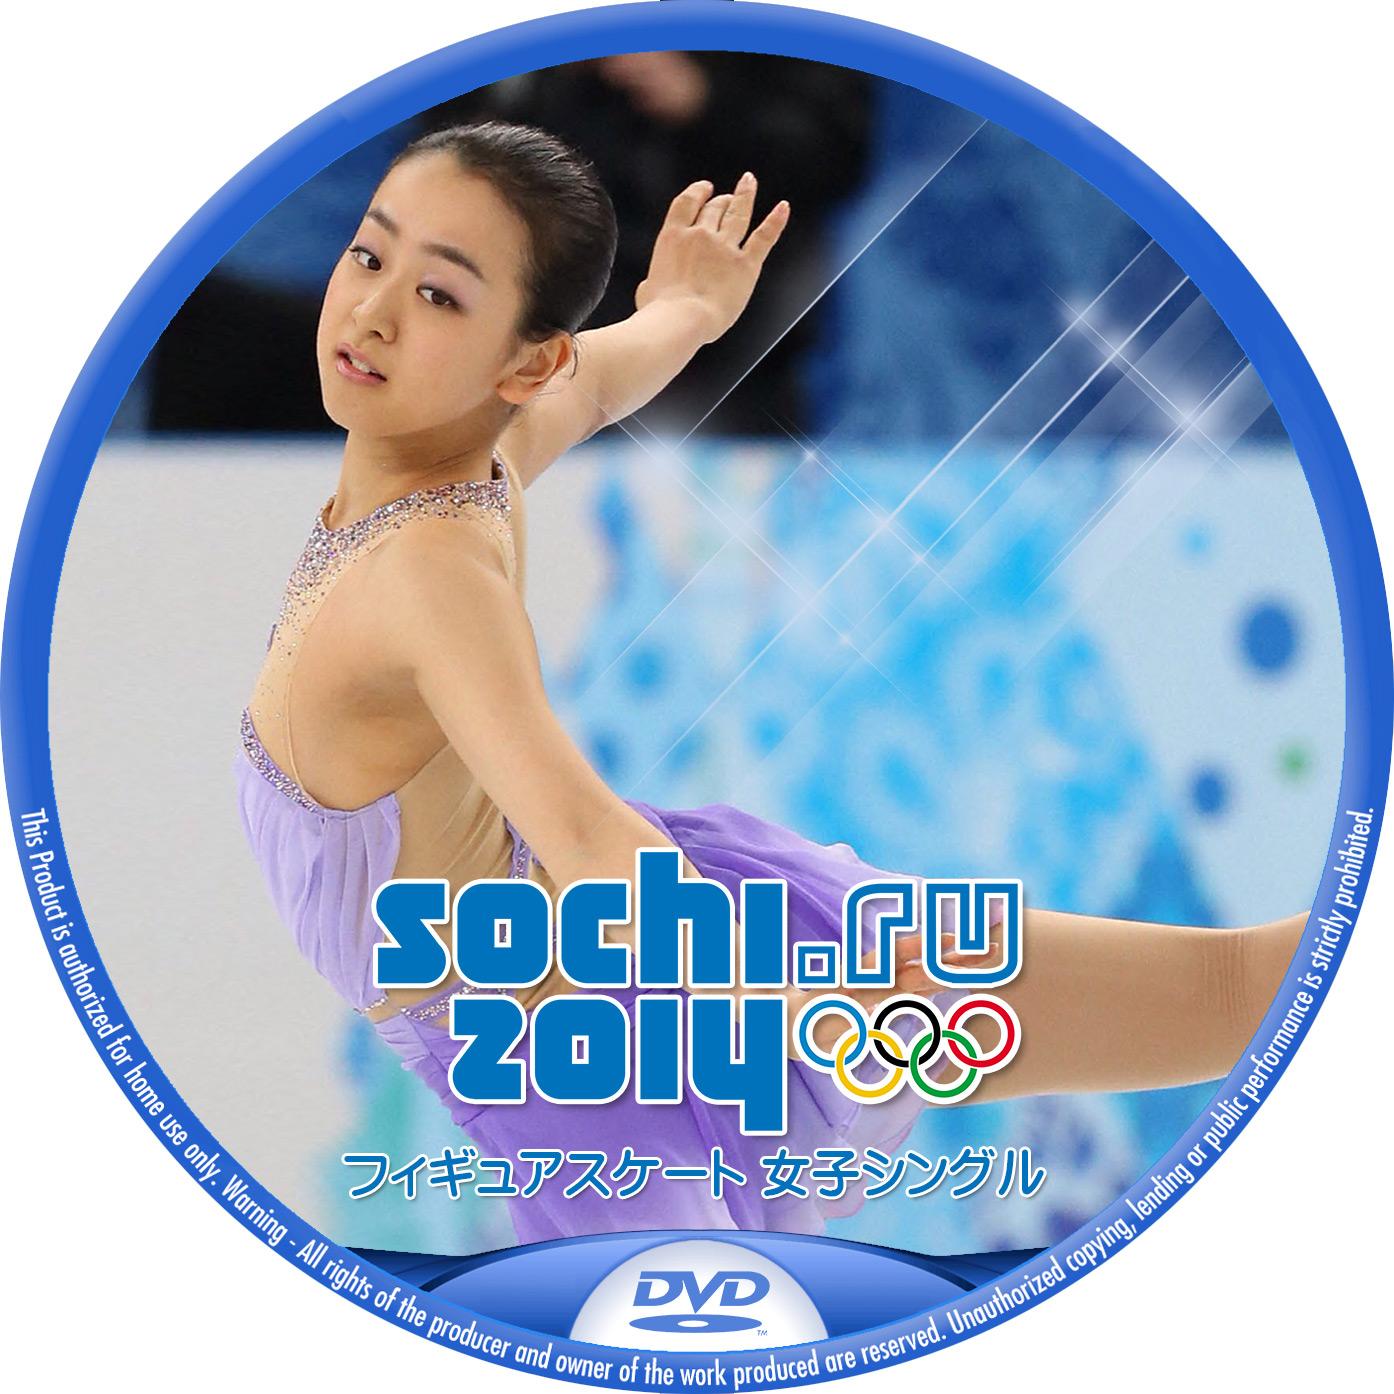 Sochi_Figure_Woens-DVD3